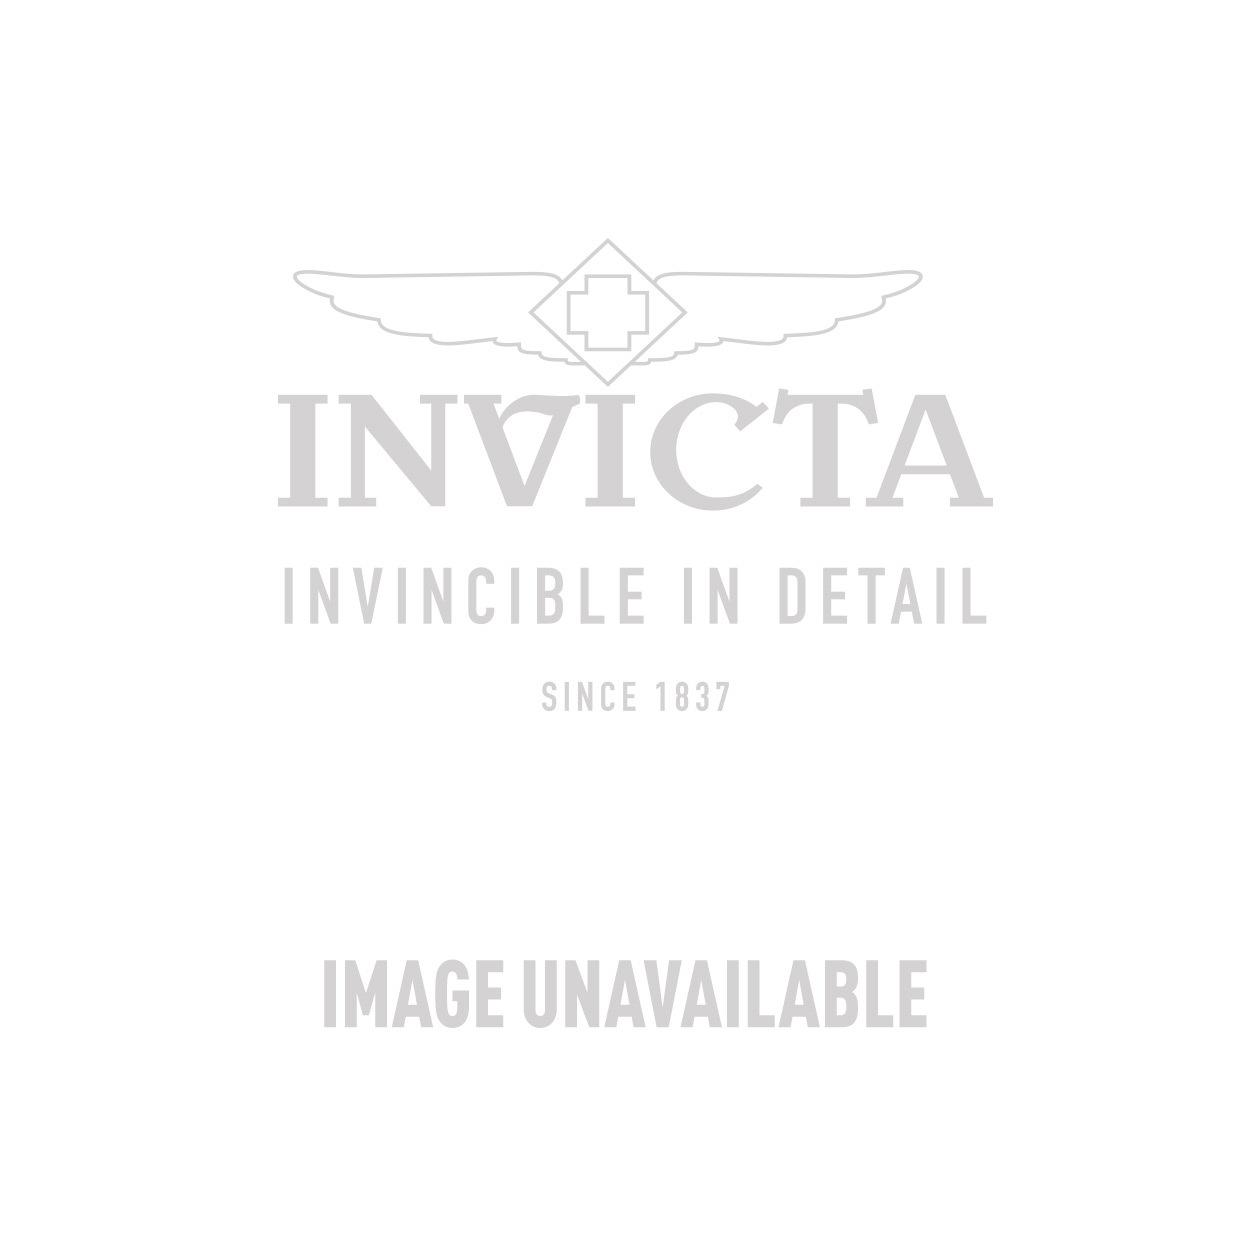 Invicta Sea Spider Swiss Made Quartz Watch - Black case with Black tone Stainless Steel, Polyurethane band - Model 18883